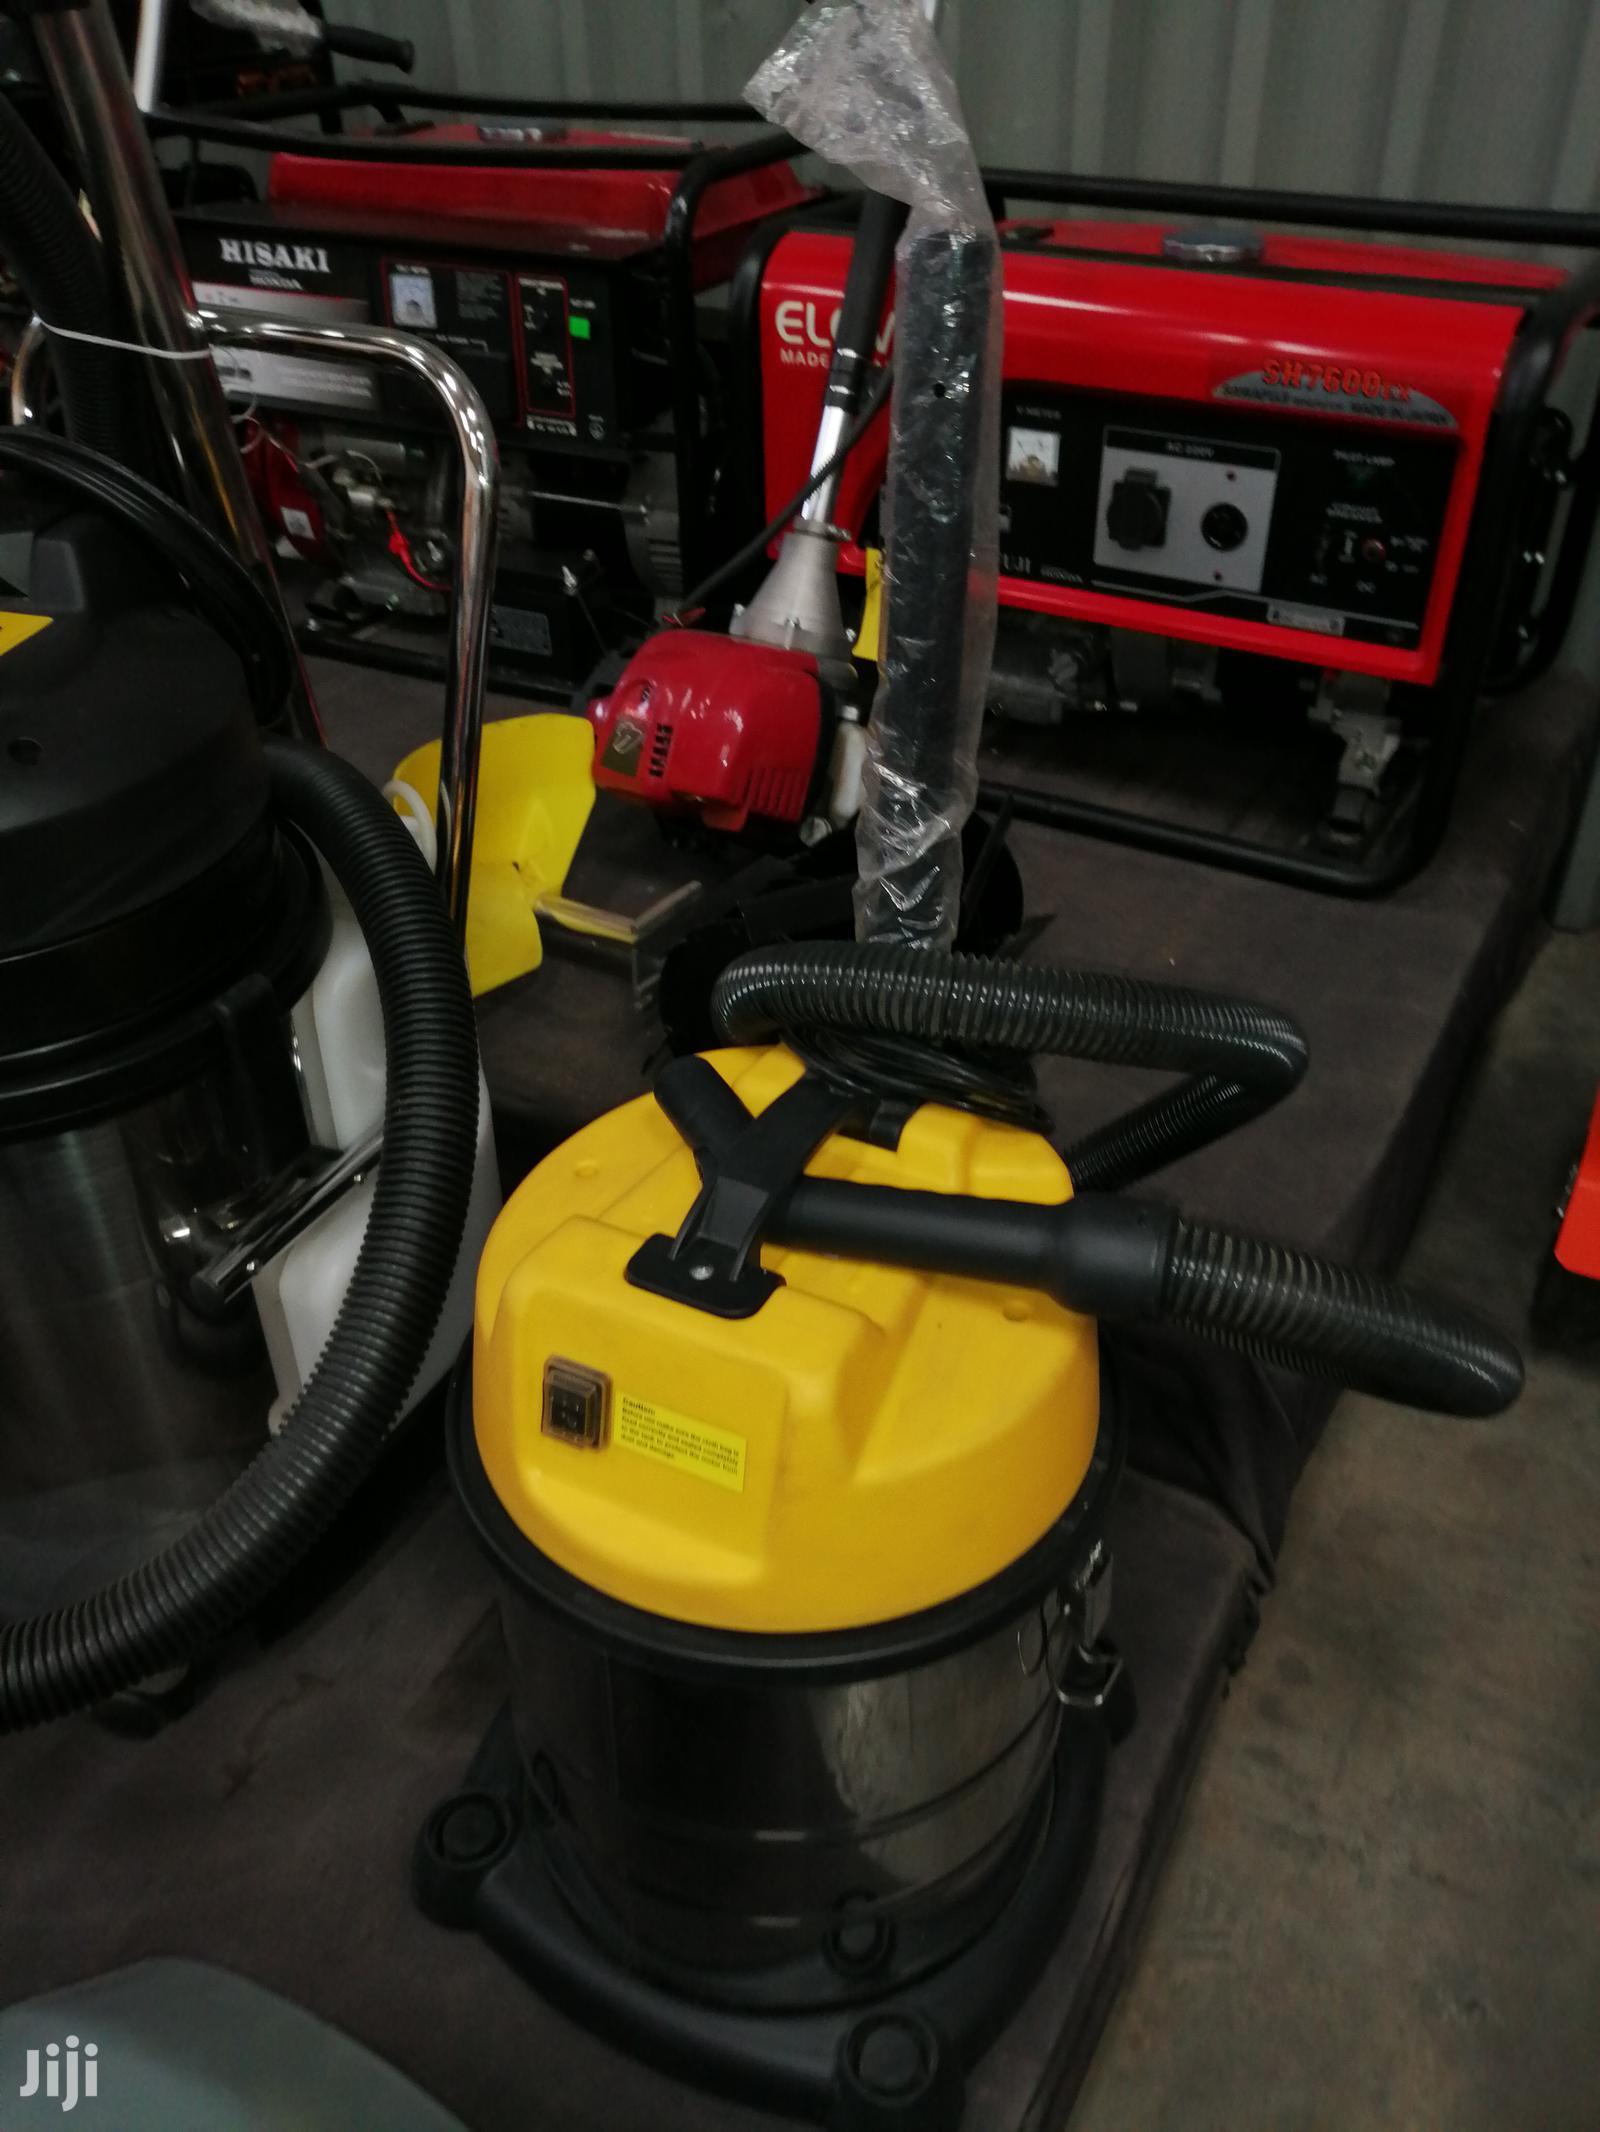 20 L Wet Dry Vacuum Cleaner | Home Appliances for sale in Imara Daima, Nairobi, Kenya